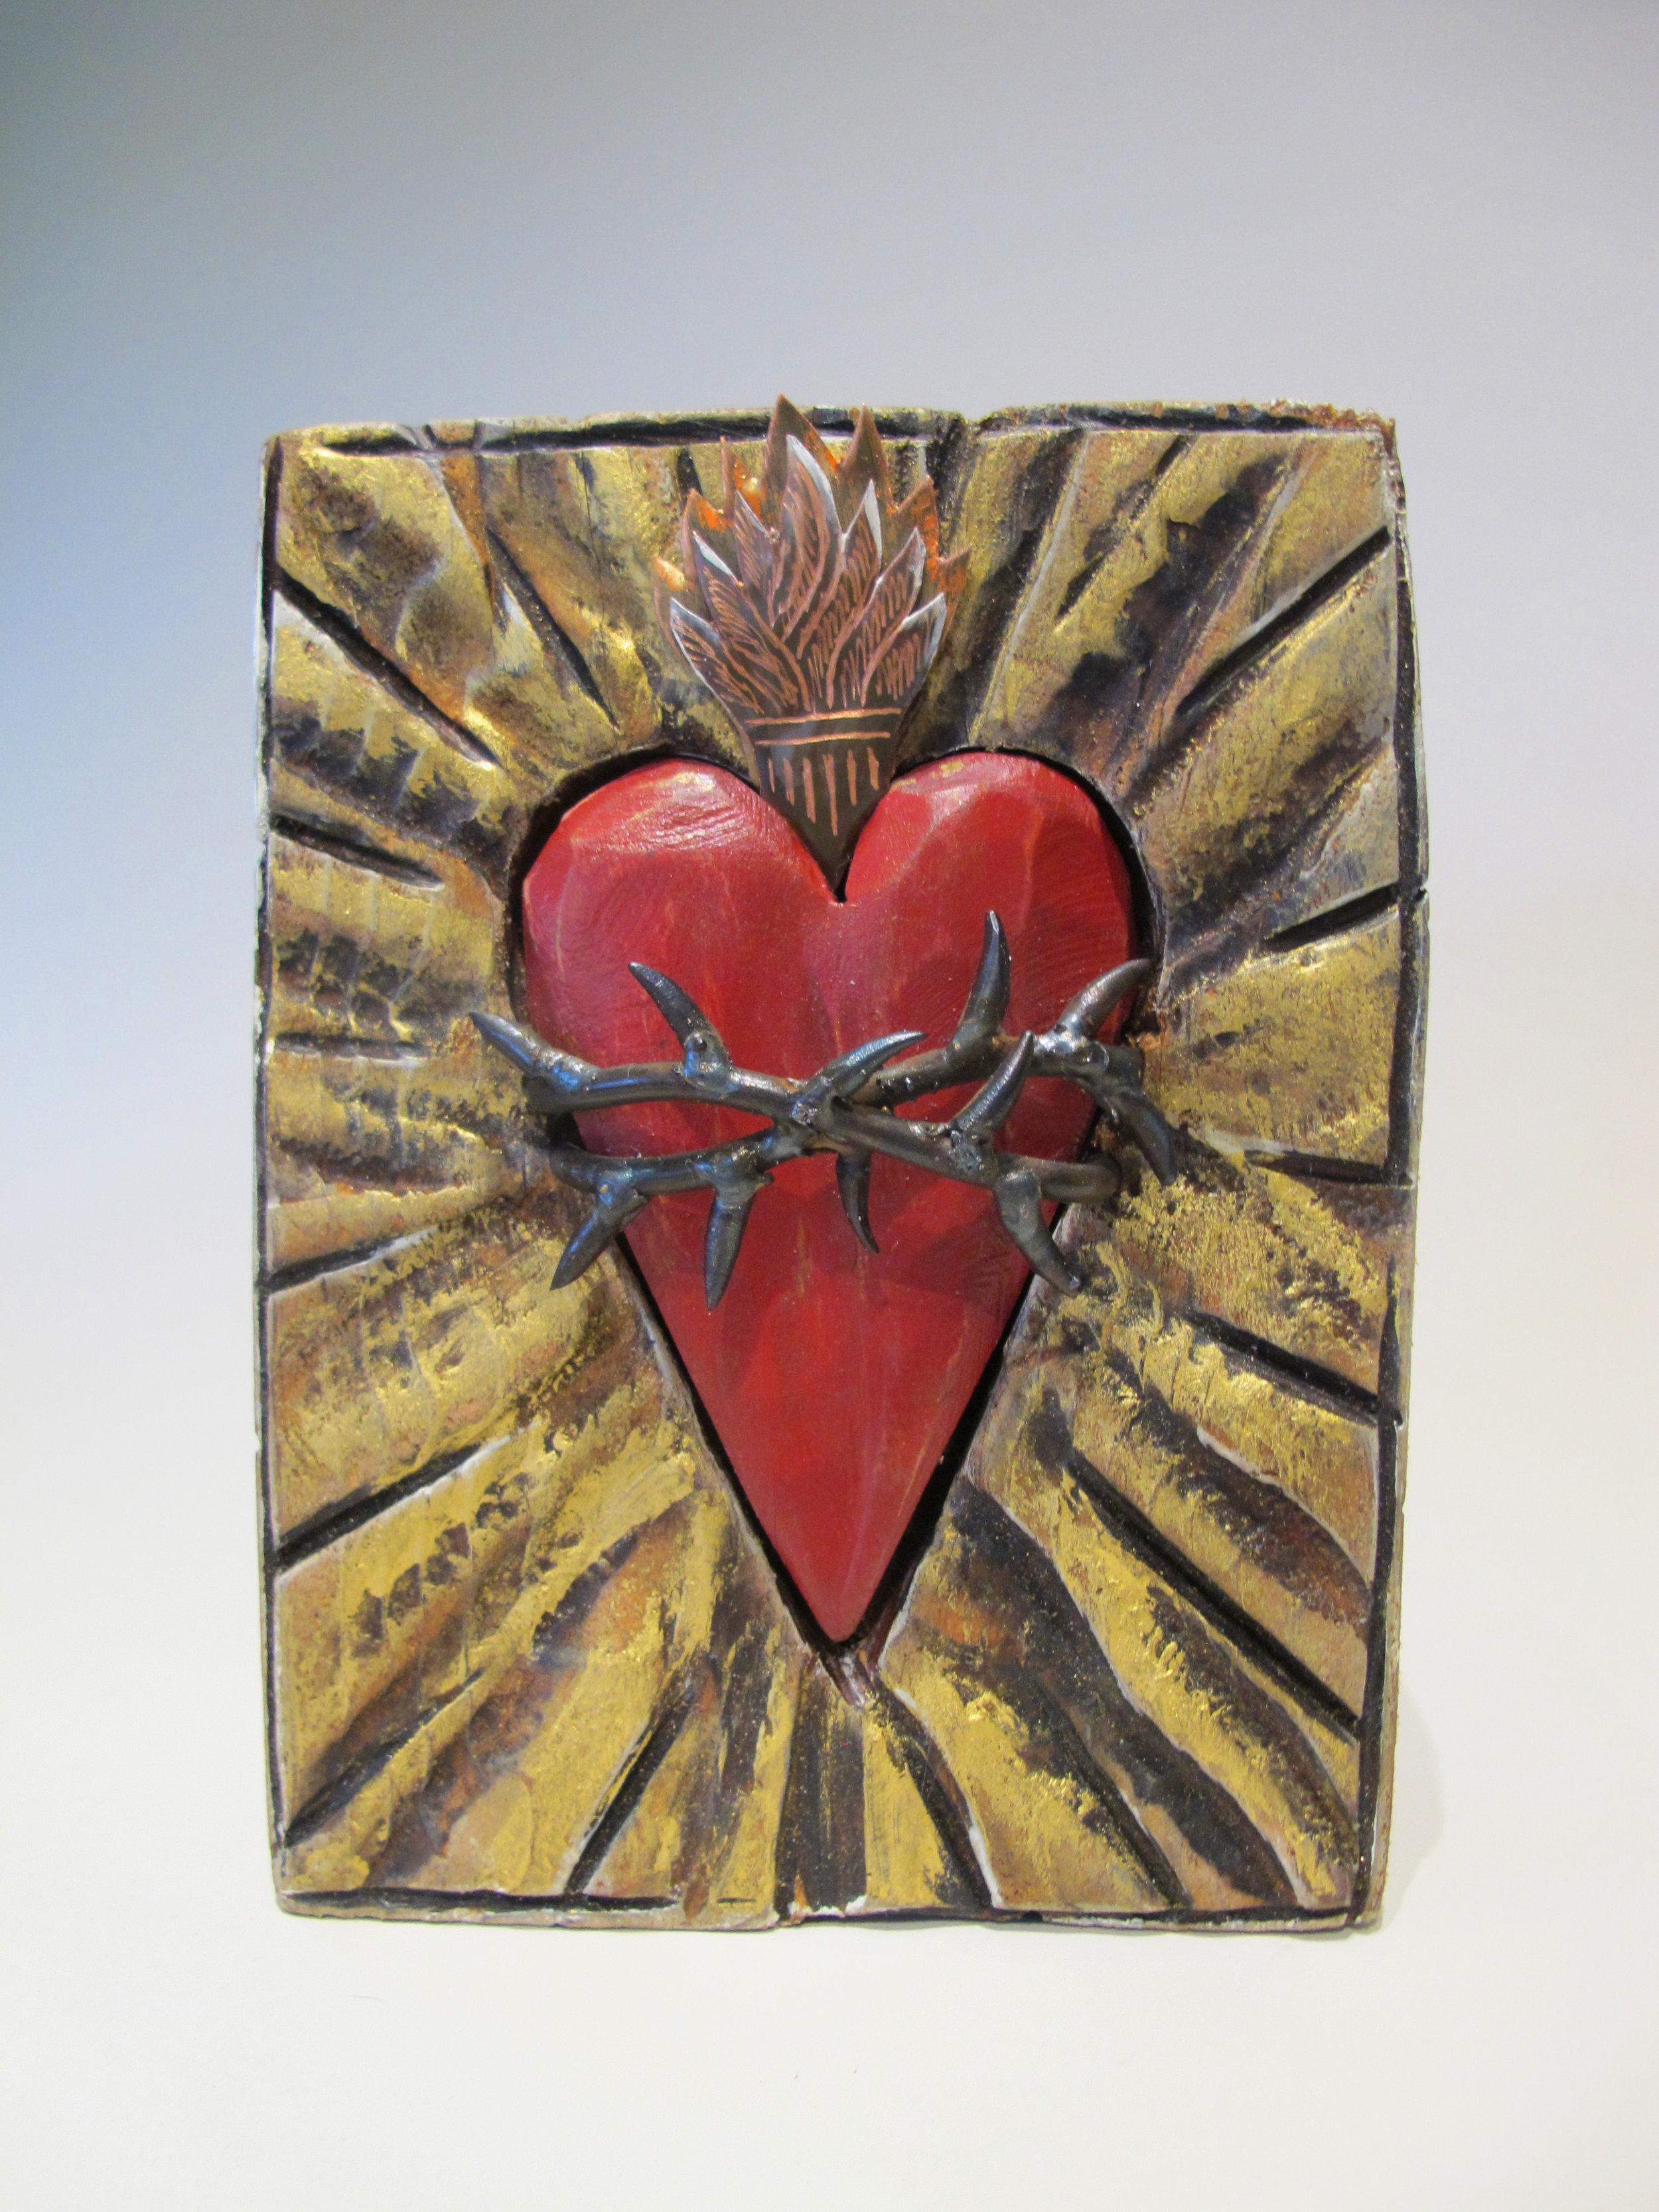 sacredheart metalthorns-01.jpg